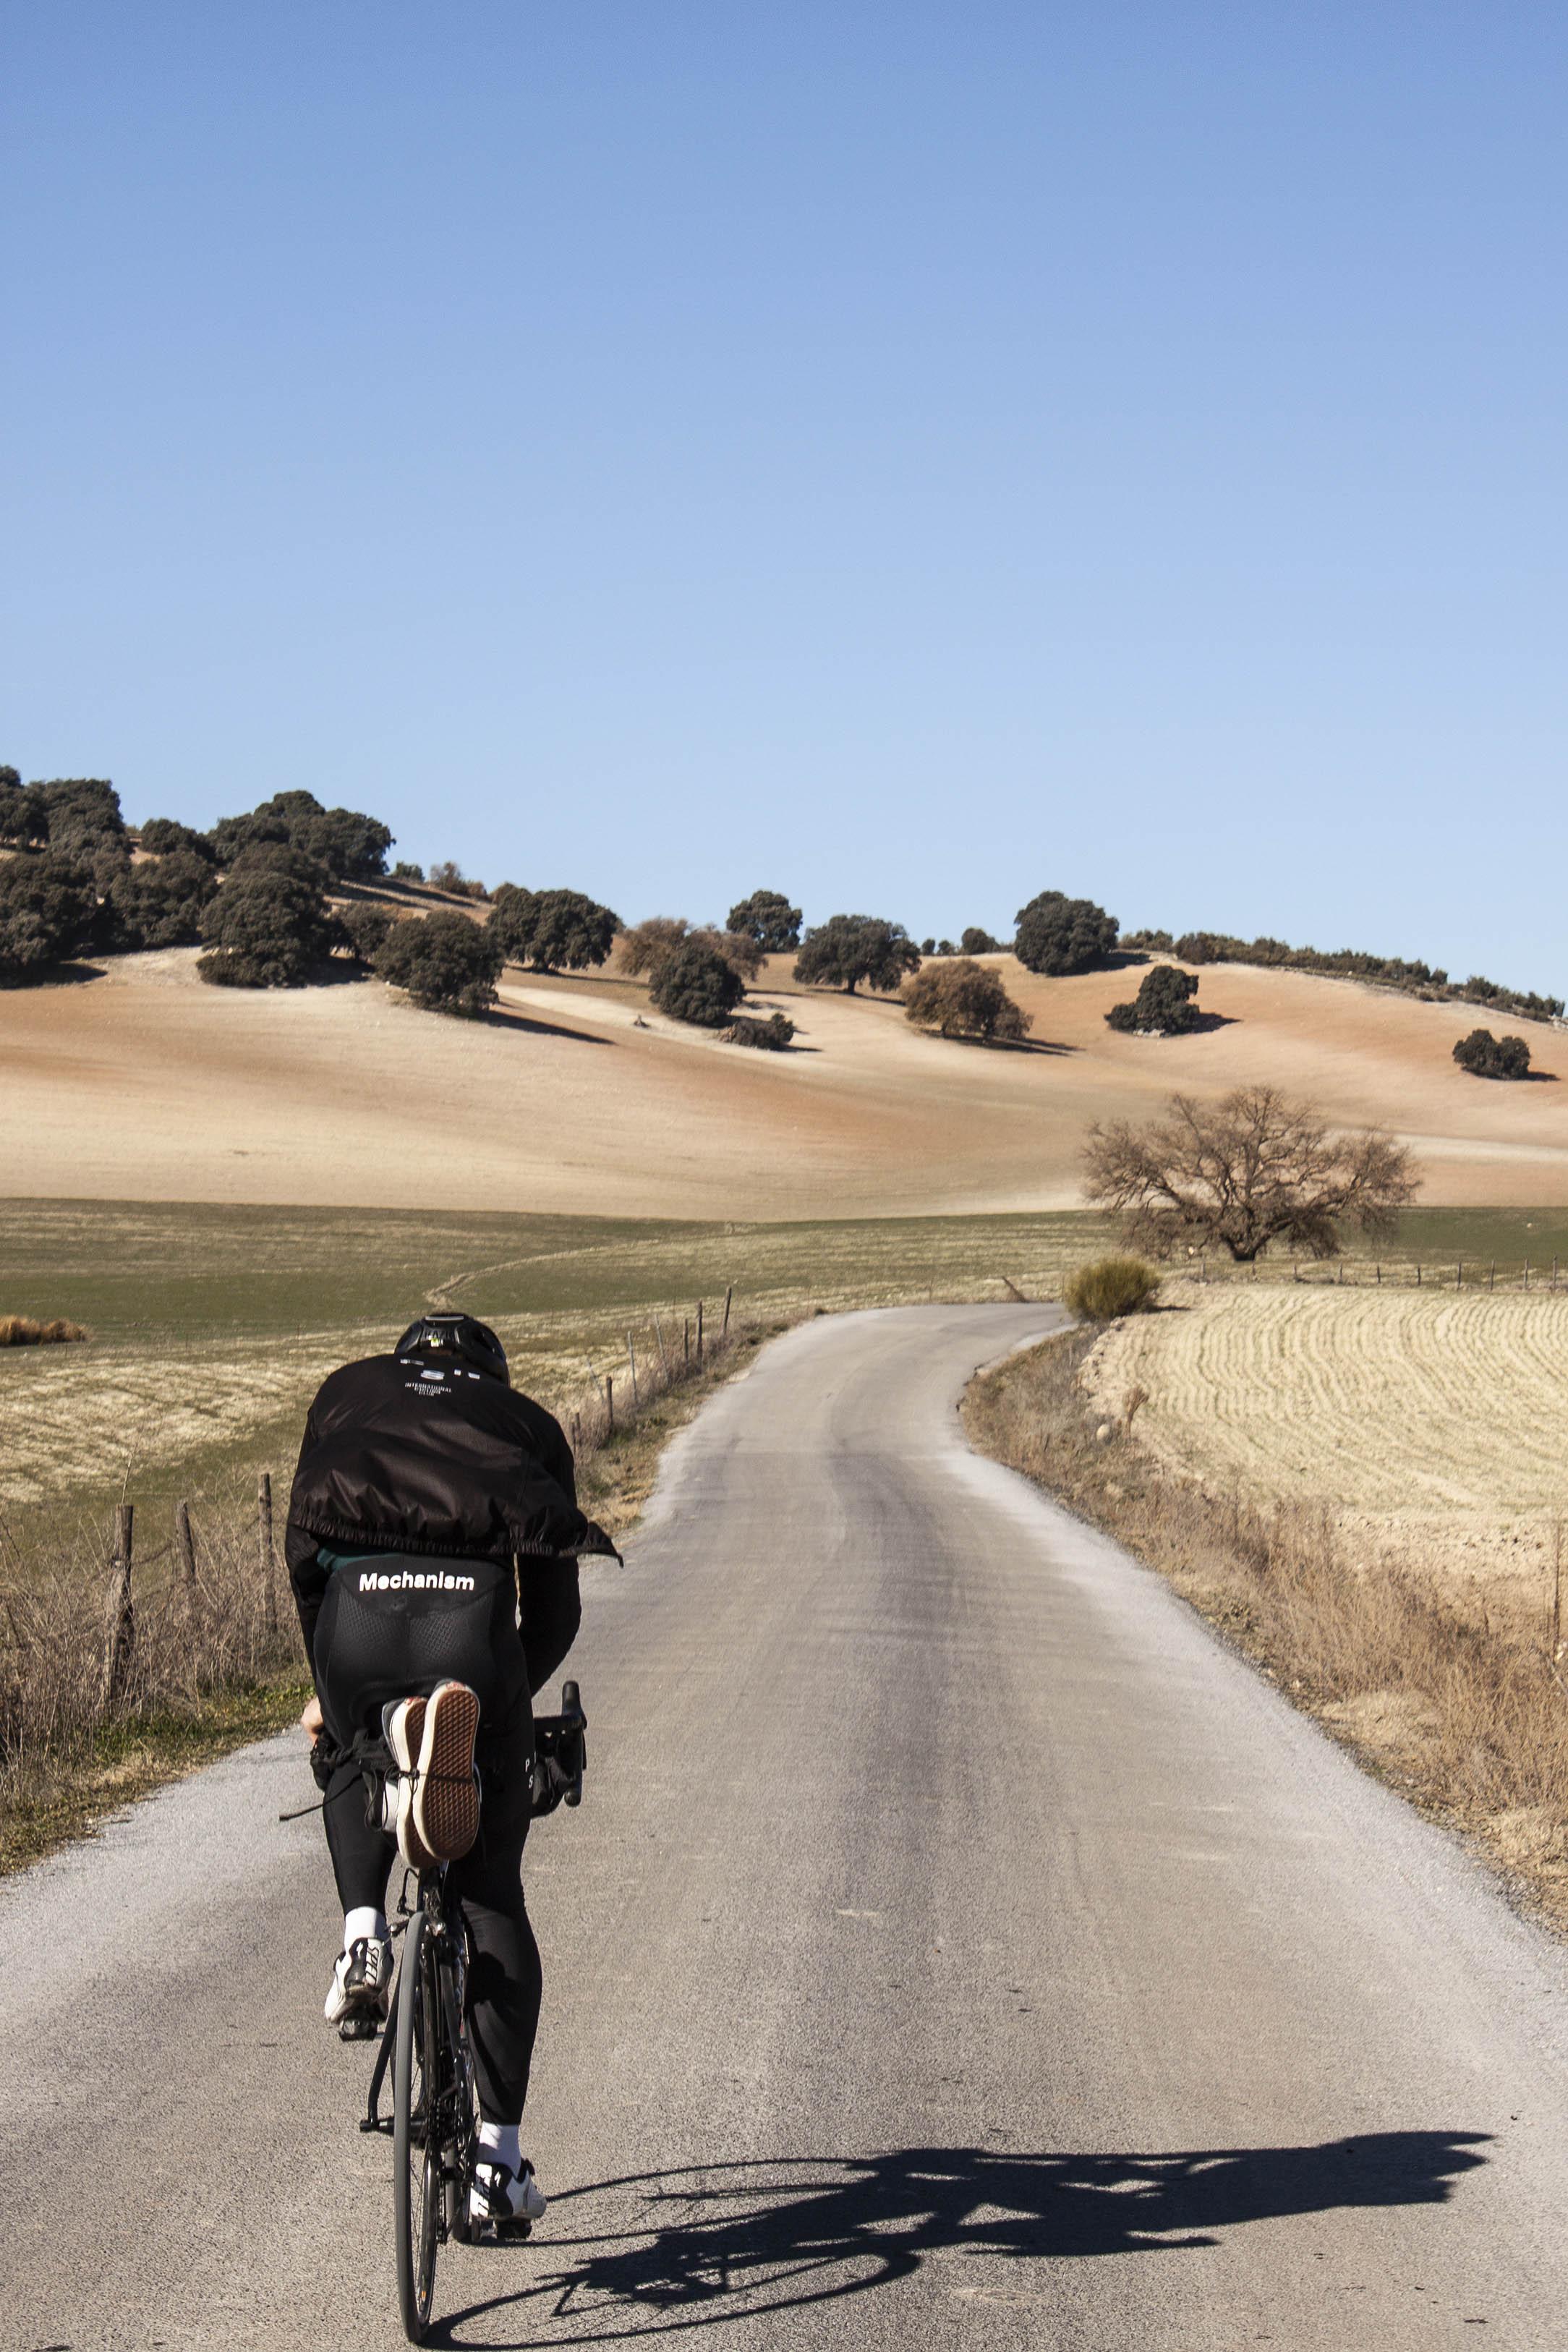 malaga-road-bike-rental-landscape5.jpg